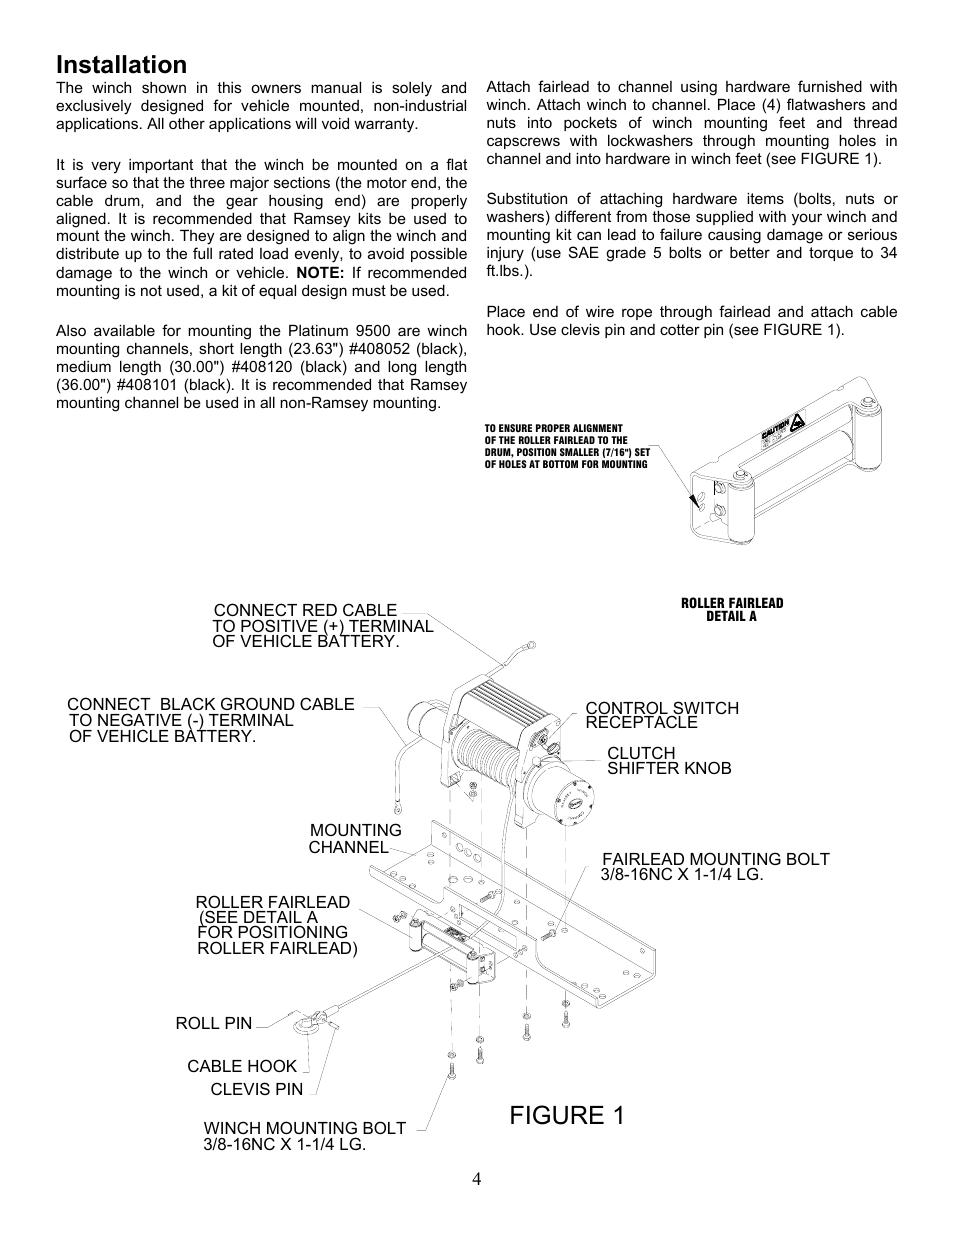 Figure 1, Installation | Ramsey Winch PLAT-9500 User Manual ... on